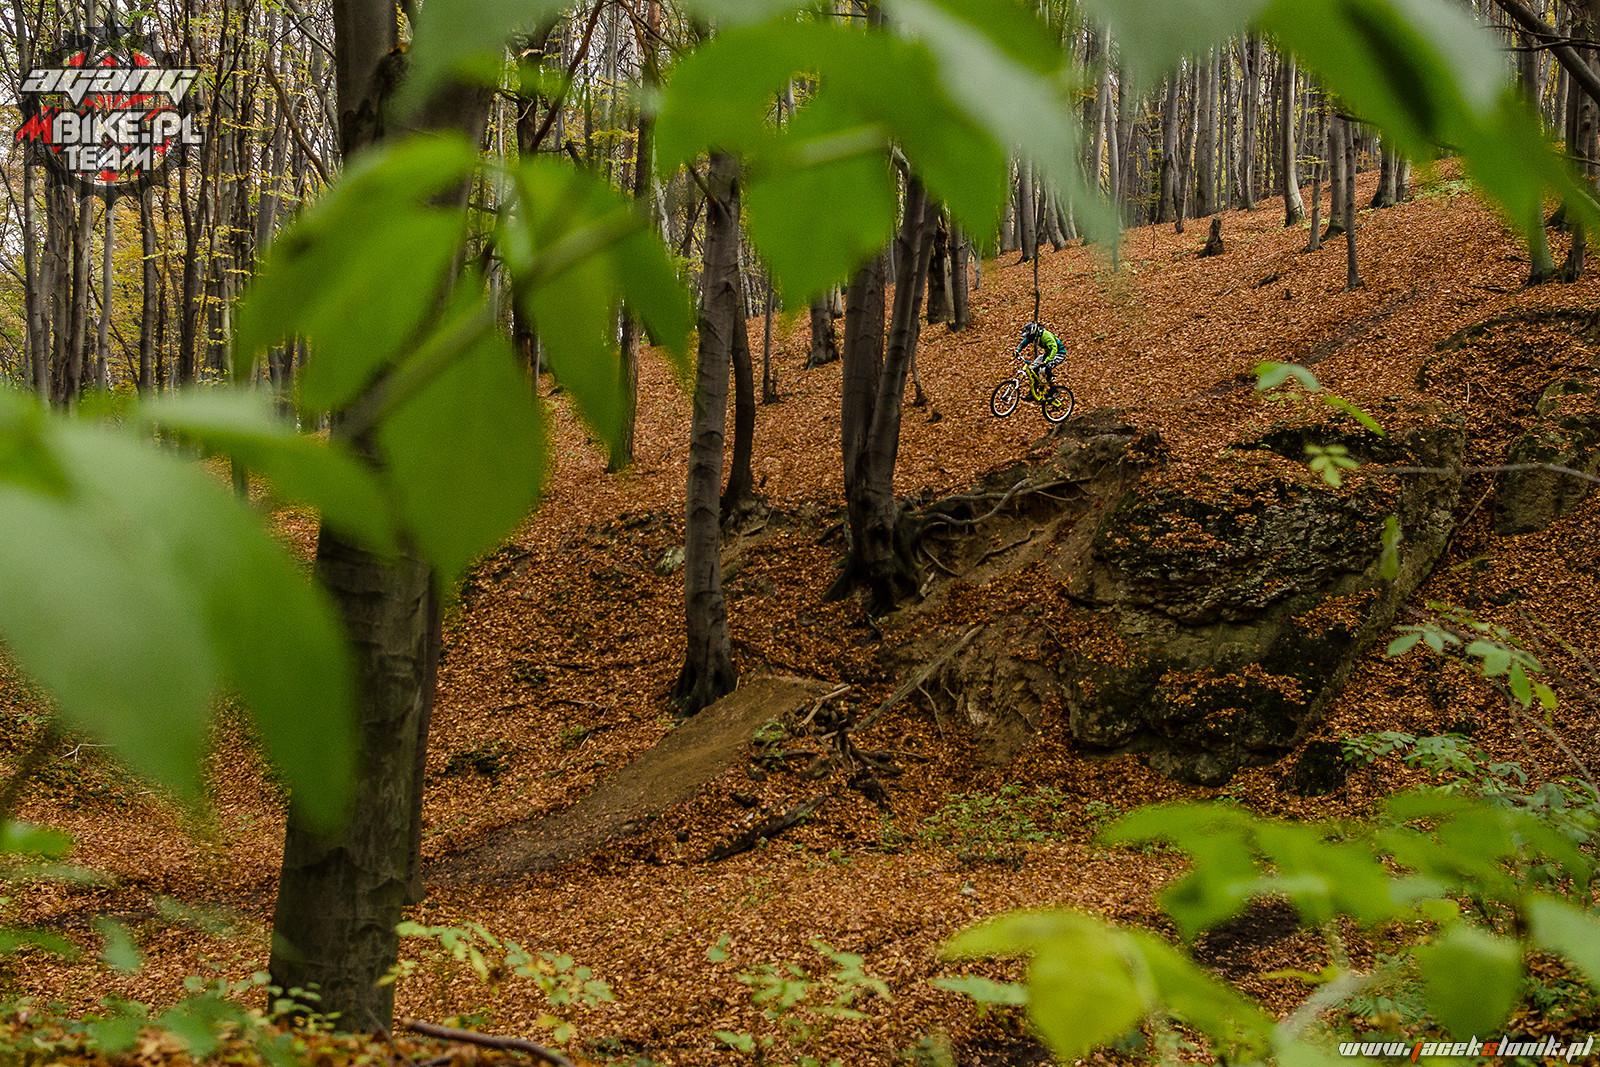 Krzysztof Kawula - JacekSlonik - Mountain Biking Pictures - Vital MTB